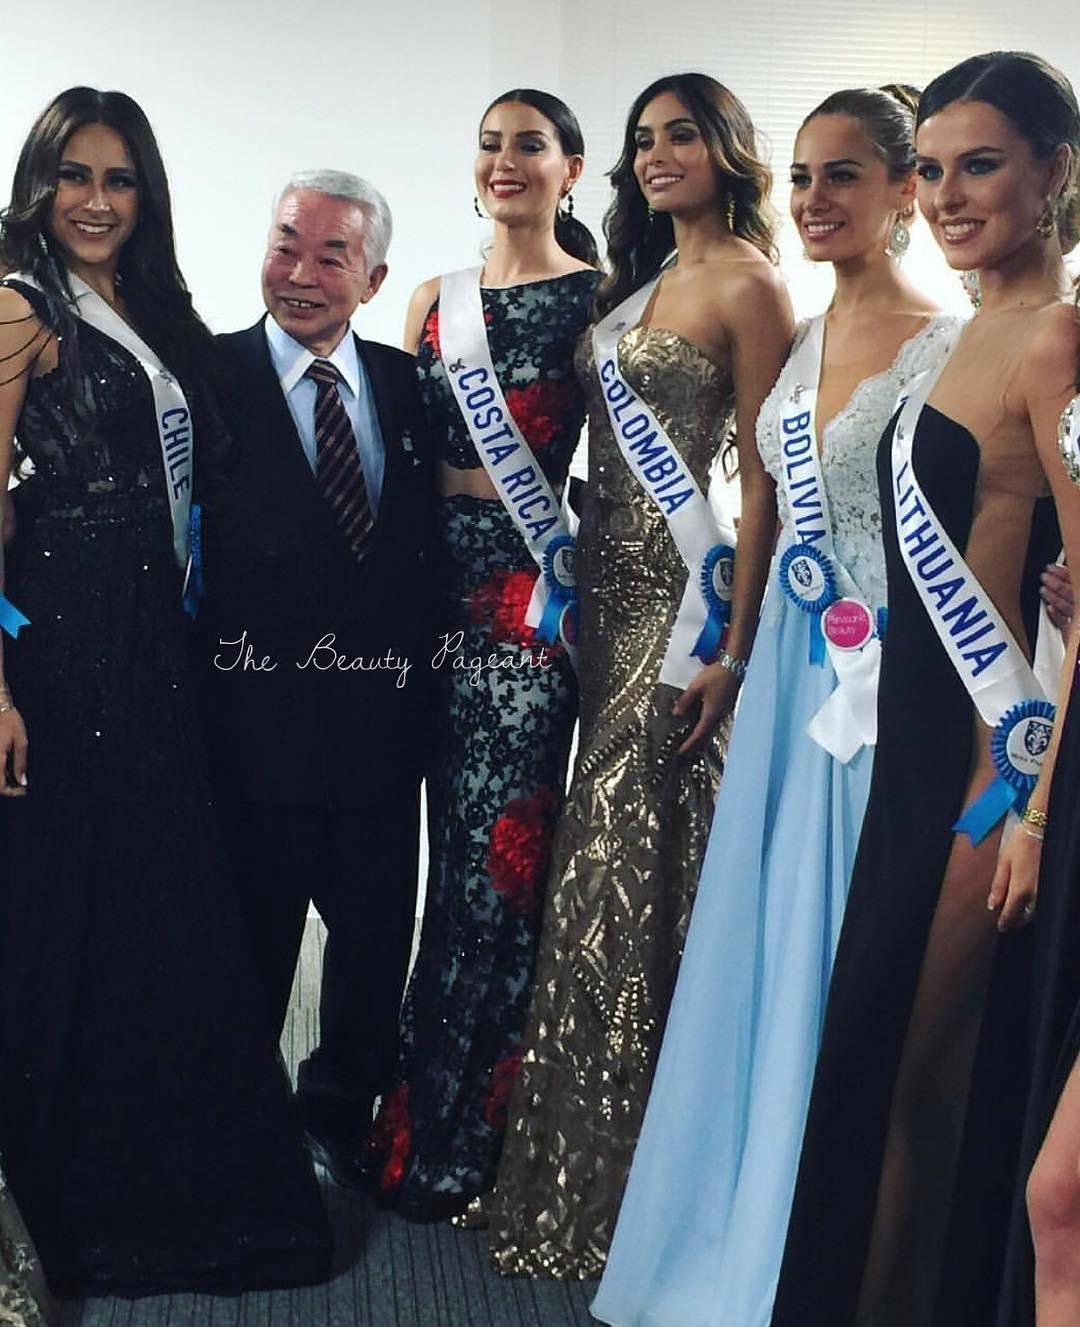 vanessa pulgarin, miss international colombia 2017. - Página 4 22802090_1949663382024490_2604498499353444352_n